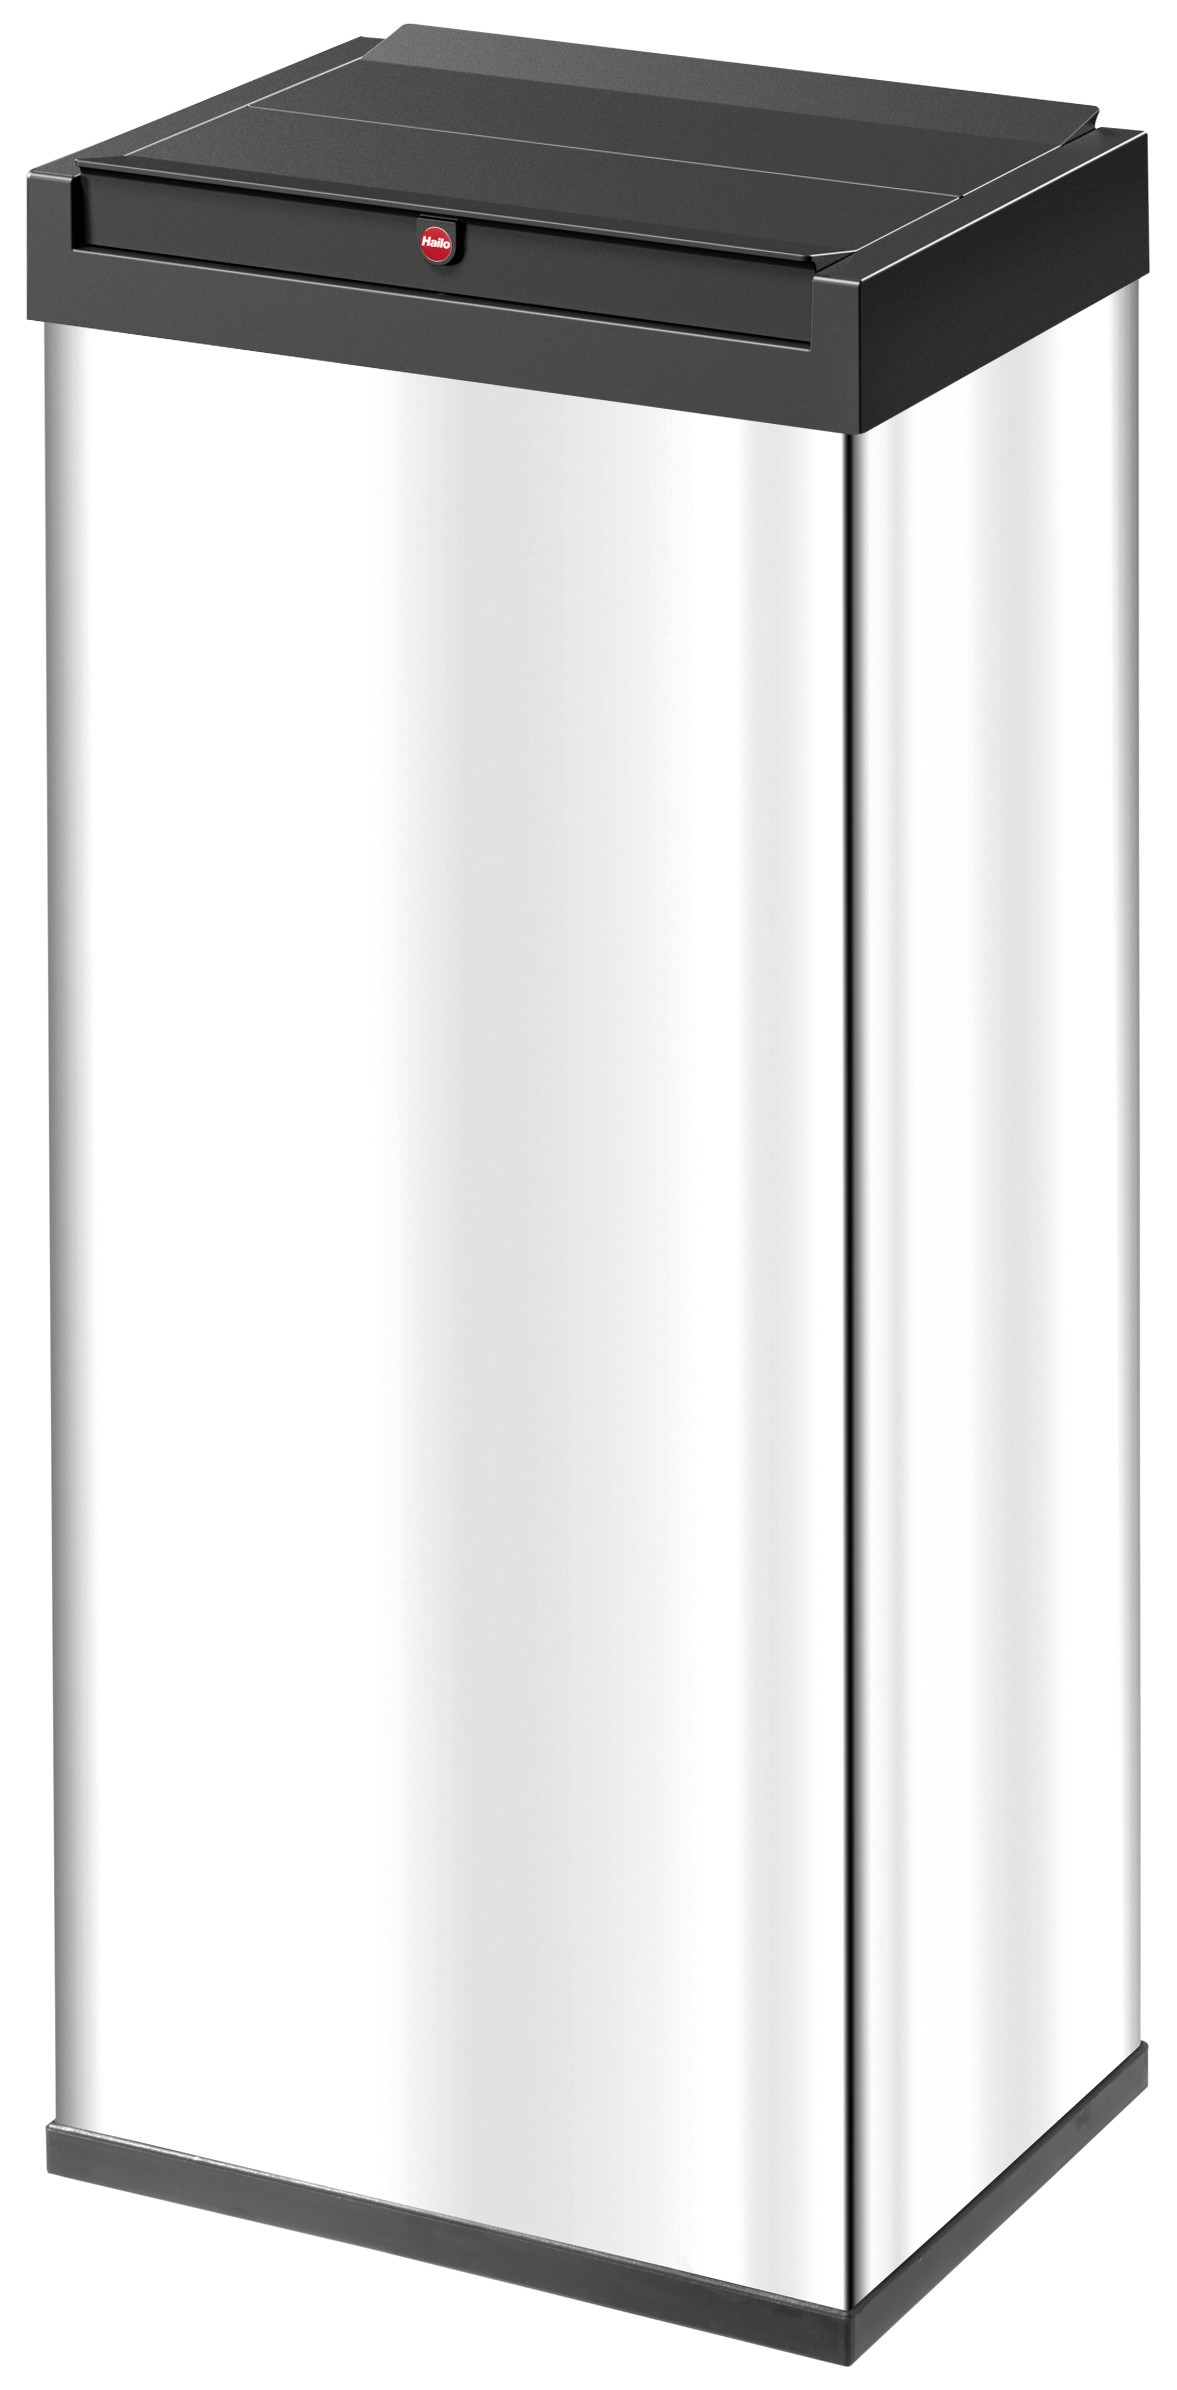 Hailo Big-Box Swing XL, Edelstahl, 52 Liter, Großraum-Abfallbox